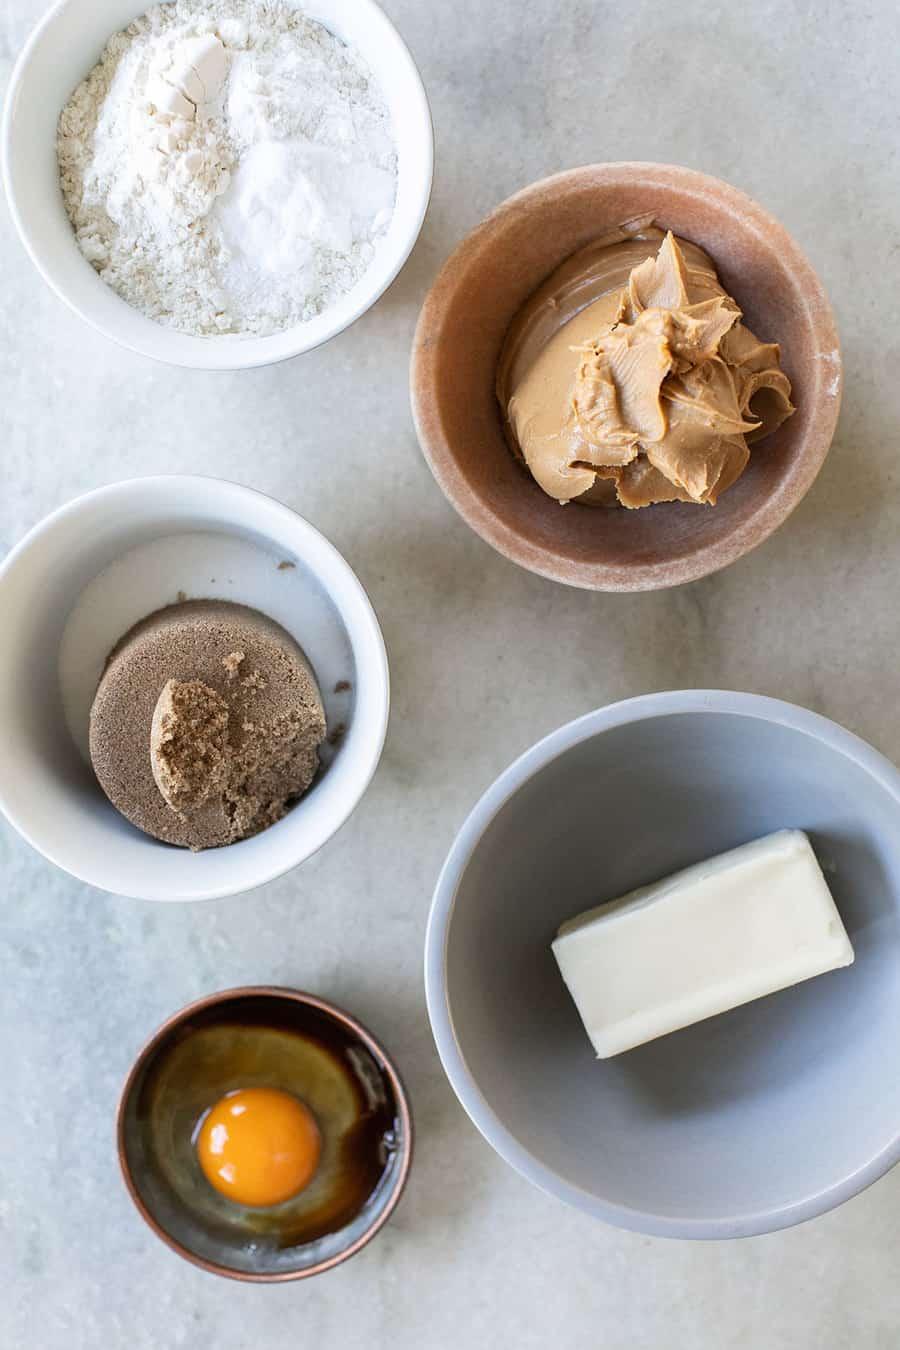 Brown Sugar, butter, egg vanilla, flour, baking soda, baking powder and salt in bowls.